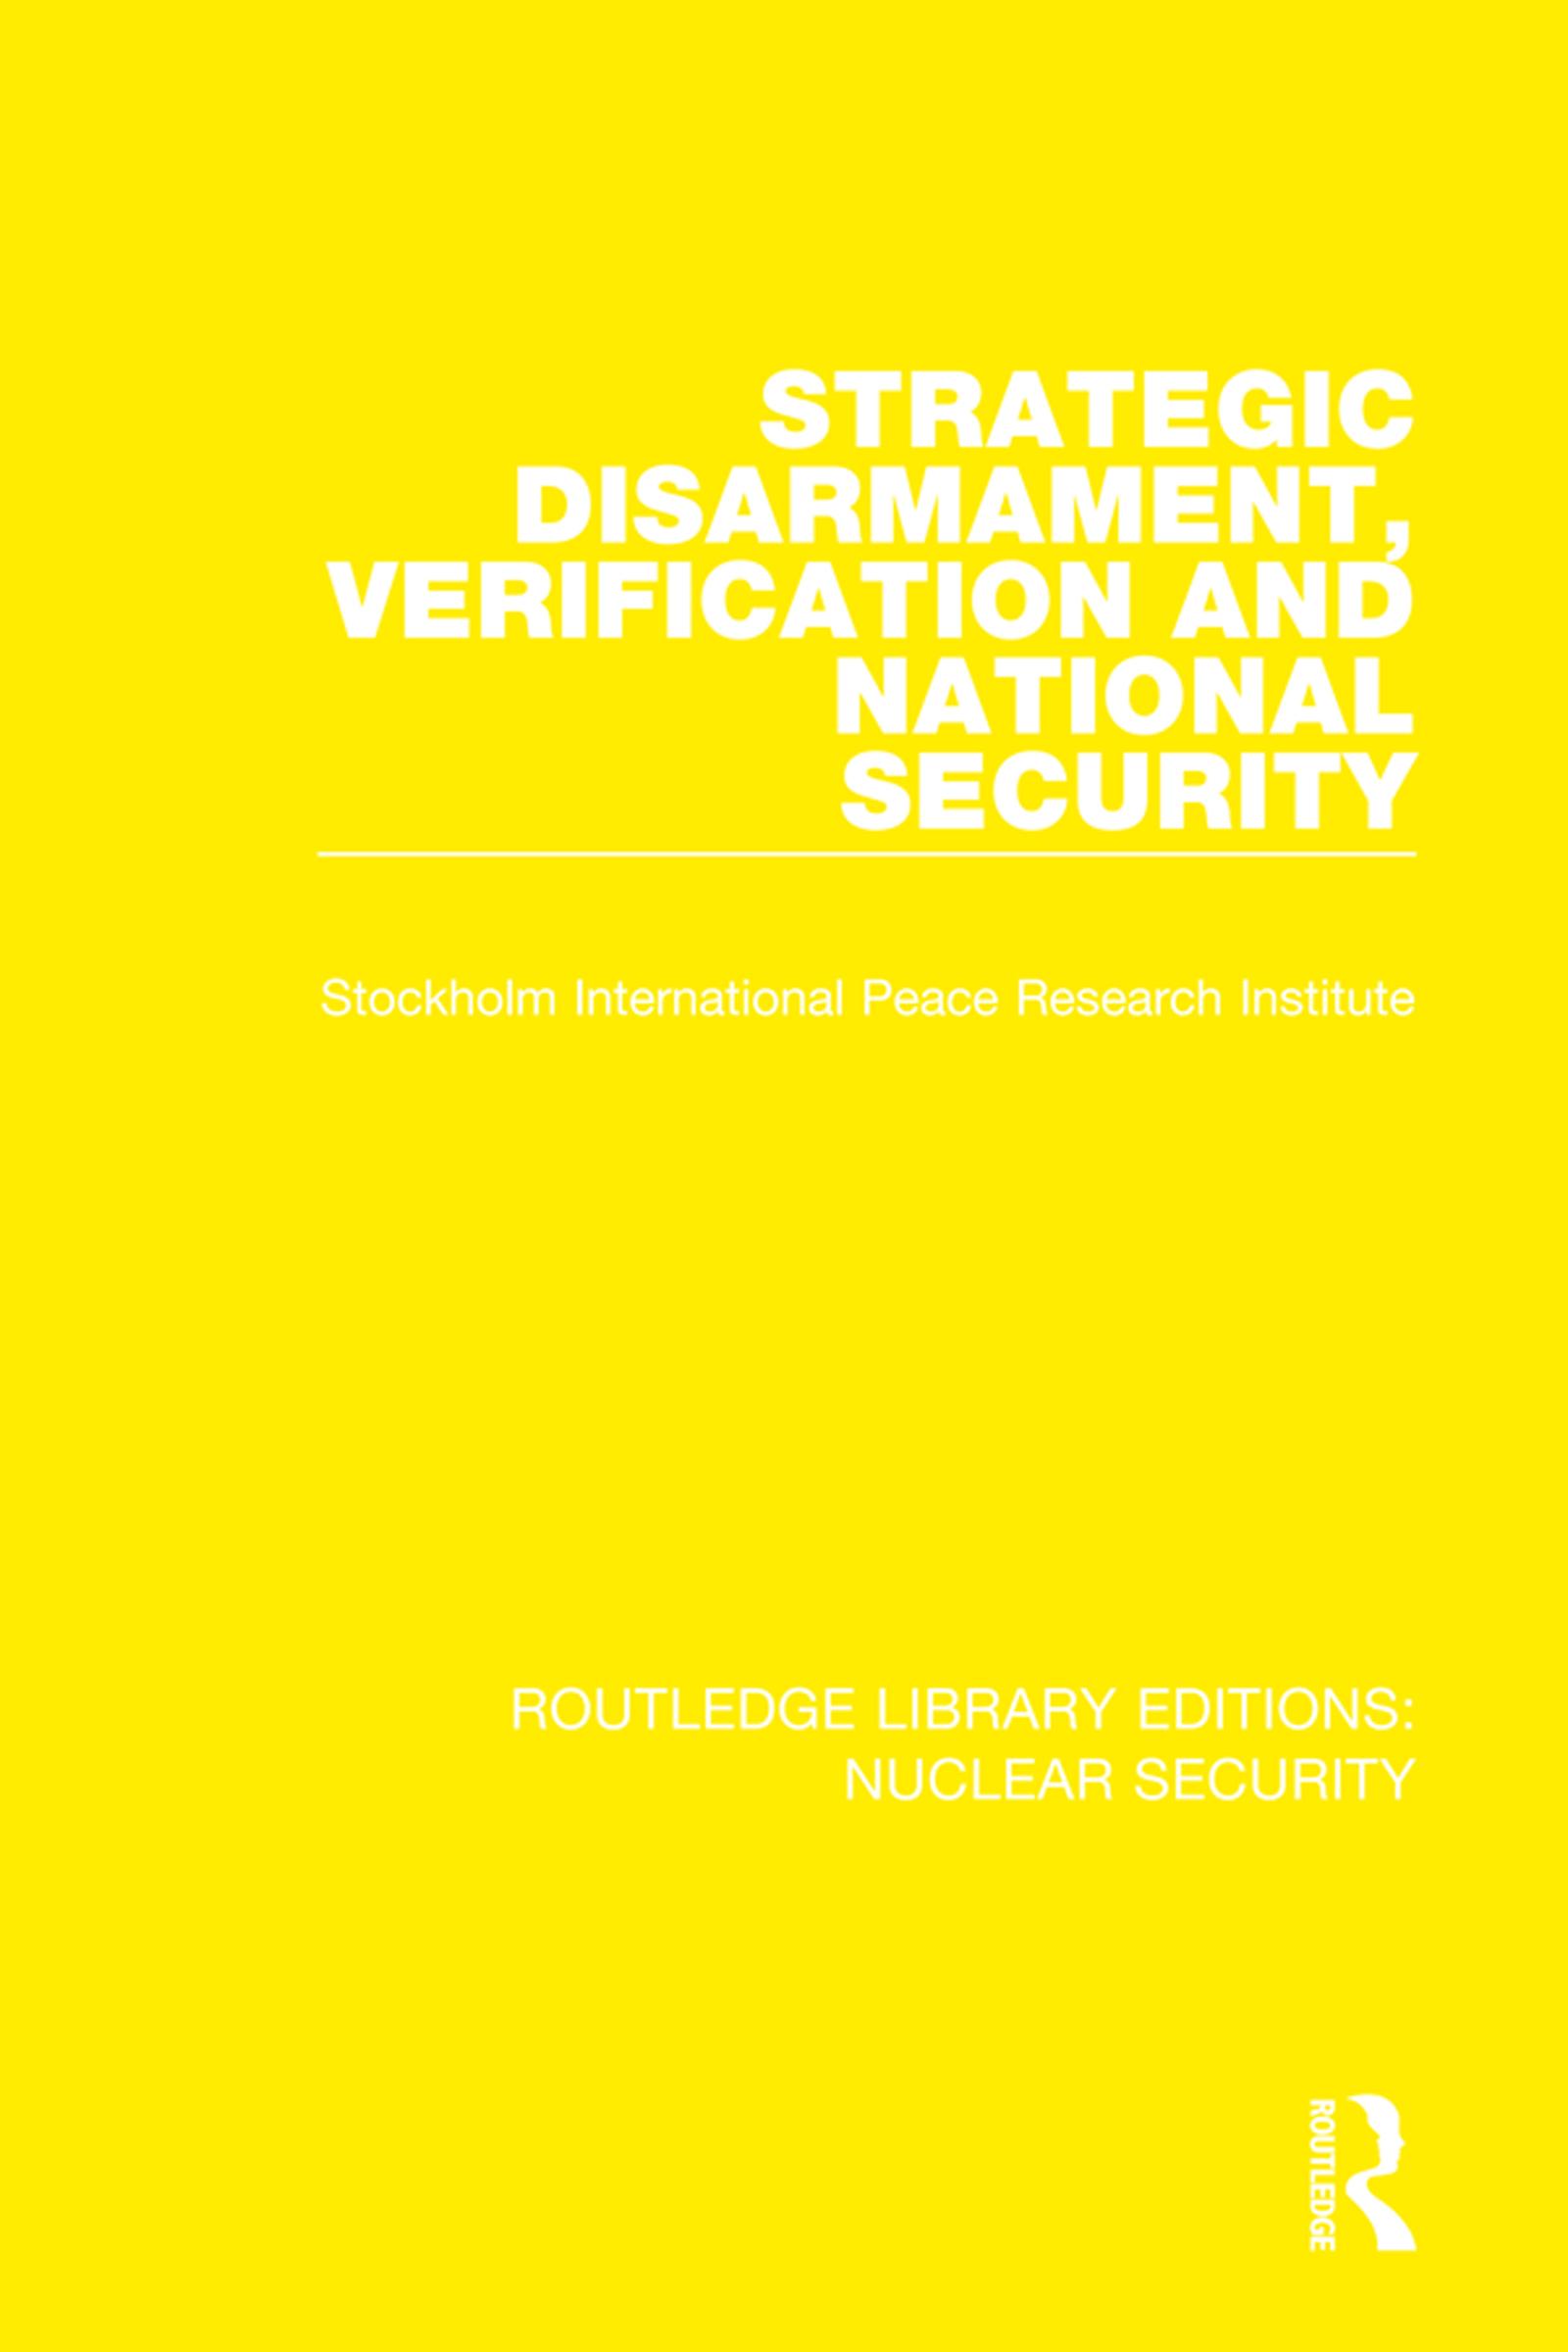 Strategic Disarmament, Verification and National Security